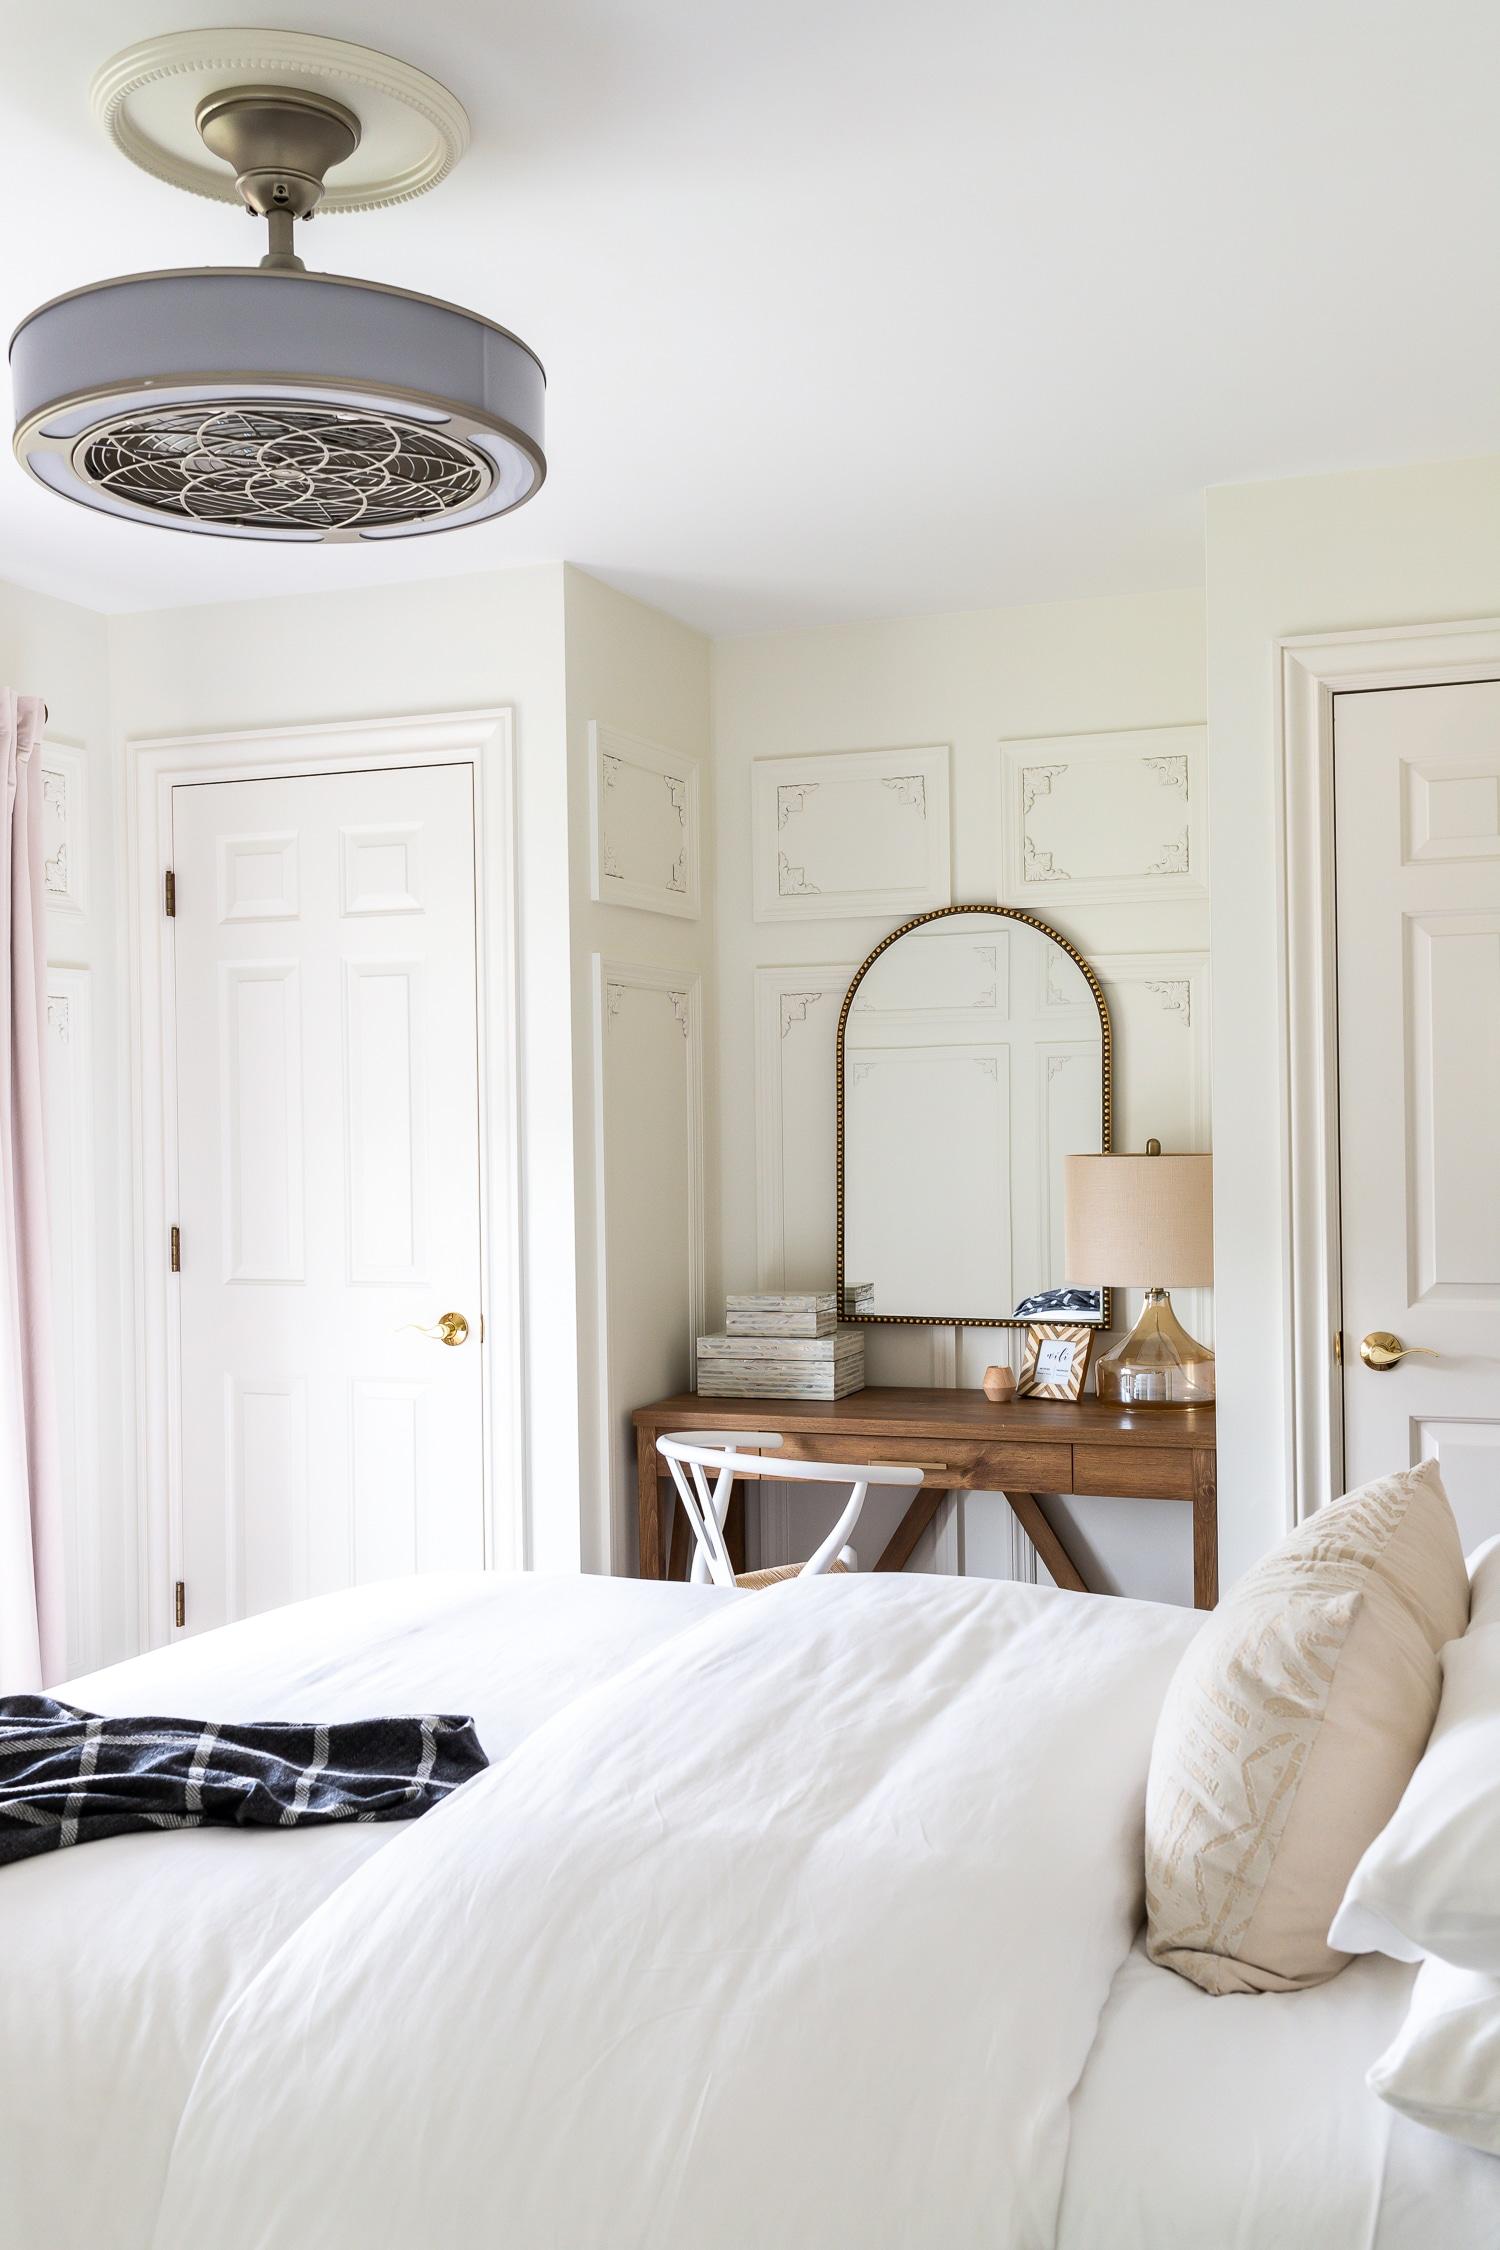 Stunning Parisian-inspired guest bedroom makeover